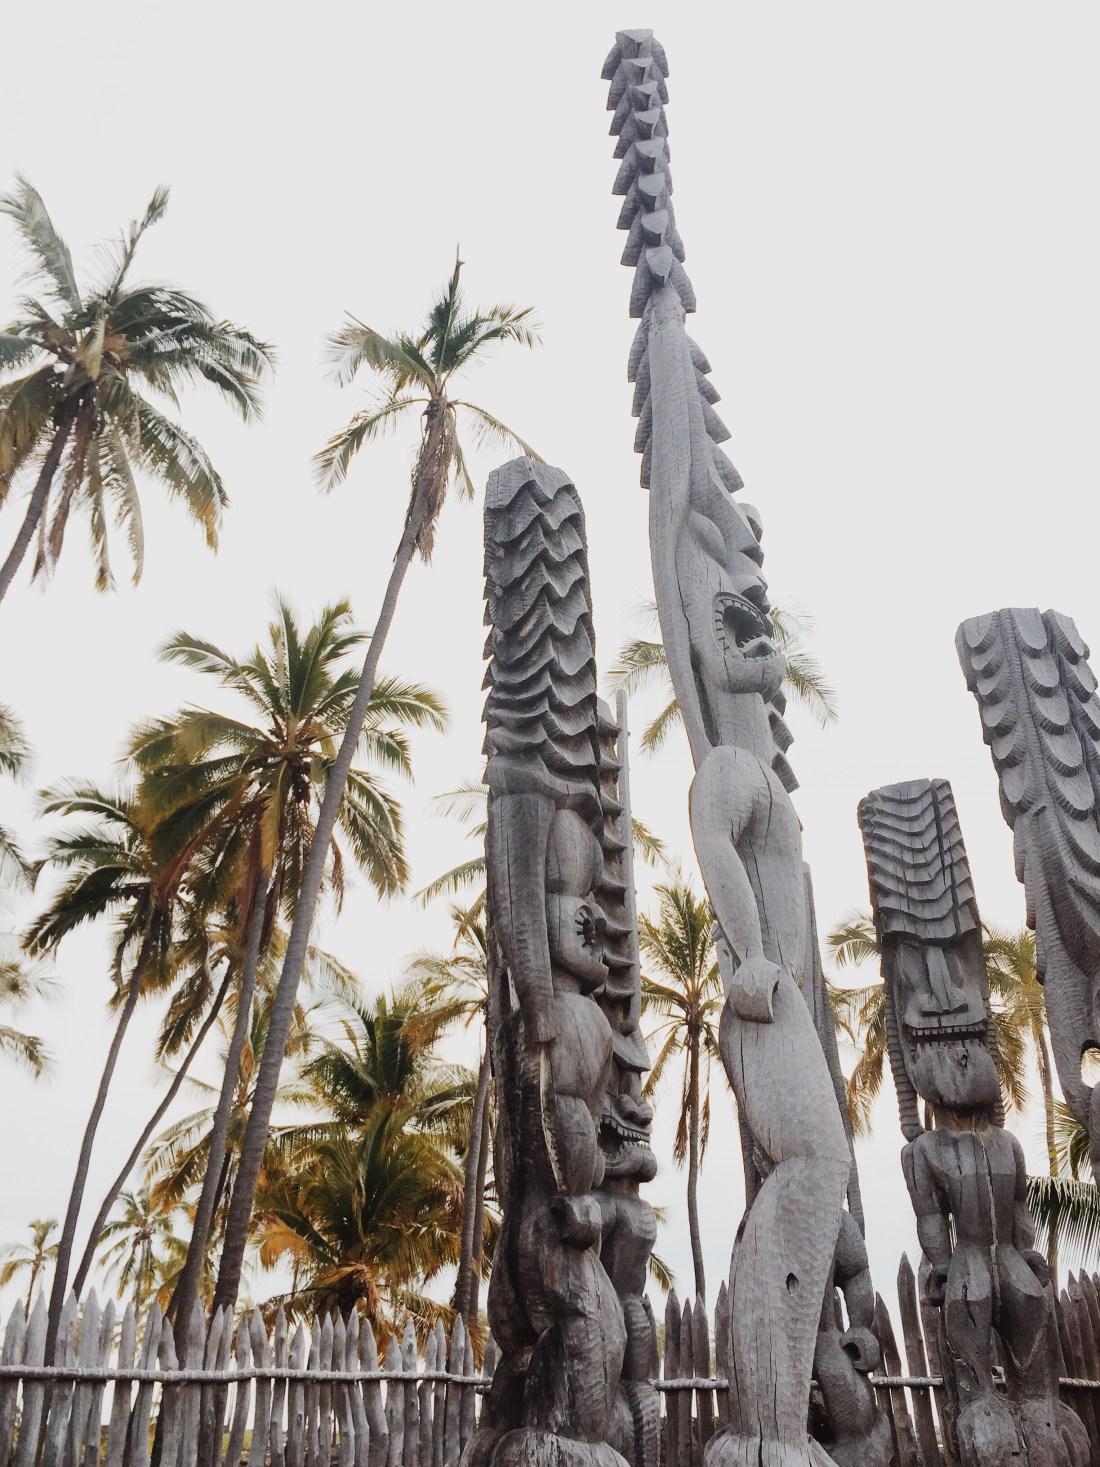 City of Refuge|Best Things To Do In Hawaii | Ultimate Big Island Travel Guide | Hawaii Travel Guide | Kona Hawaii | Hilo Hawaii | Traveling to Hawaii | Things To Do In Hawaii | Vacationing to the Big Island of Hawaii | What To Do On The Big Island of Hawaii | via @elanaloo + elanaloo.com